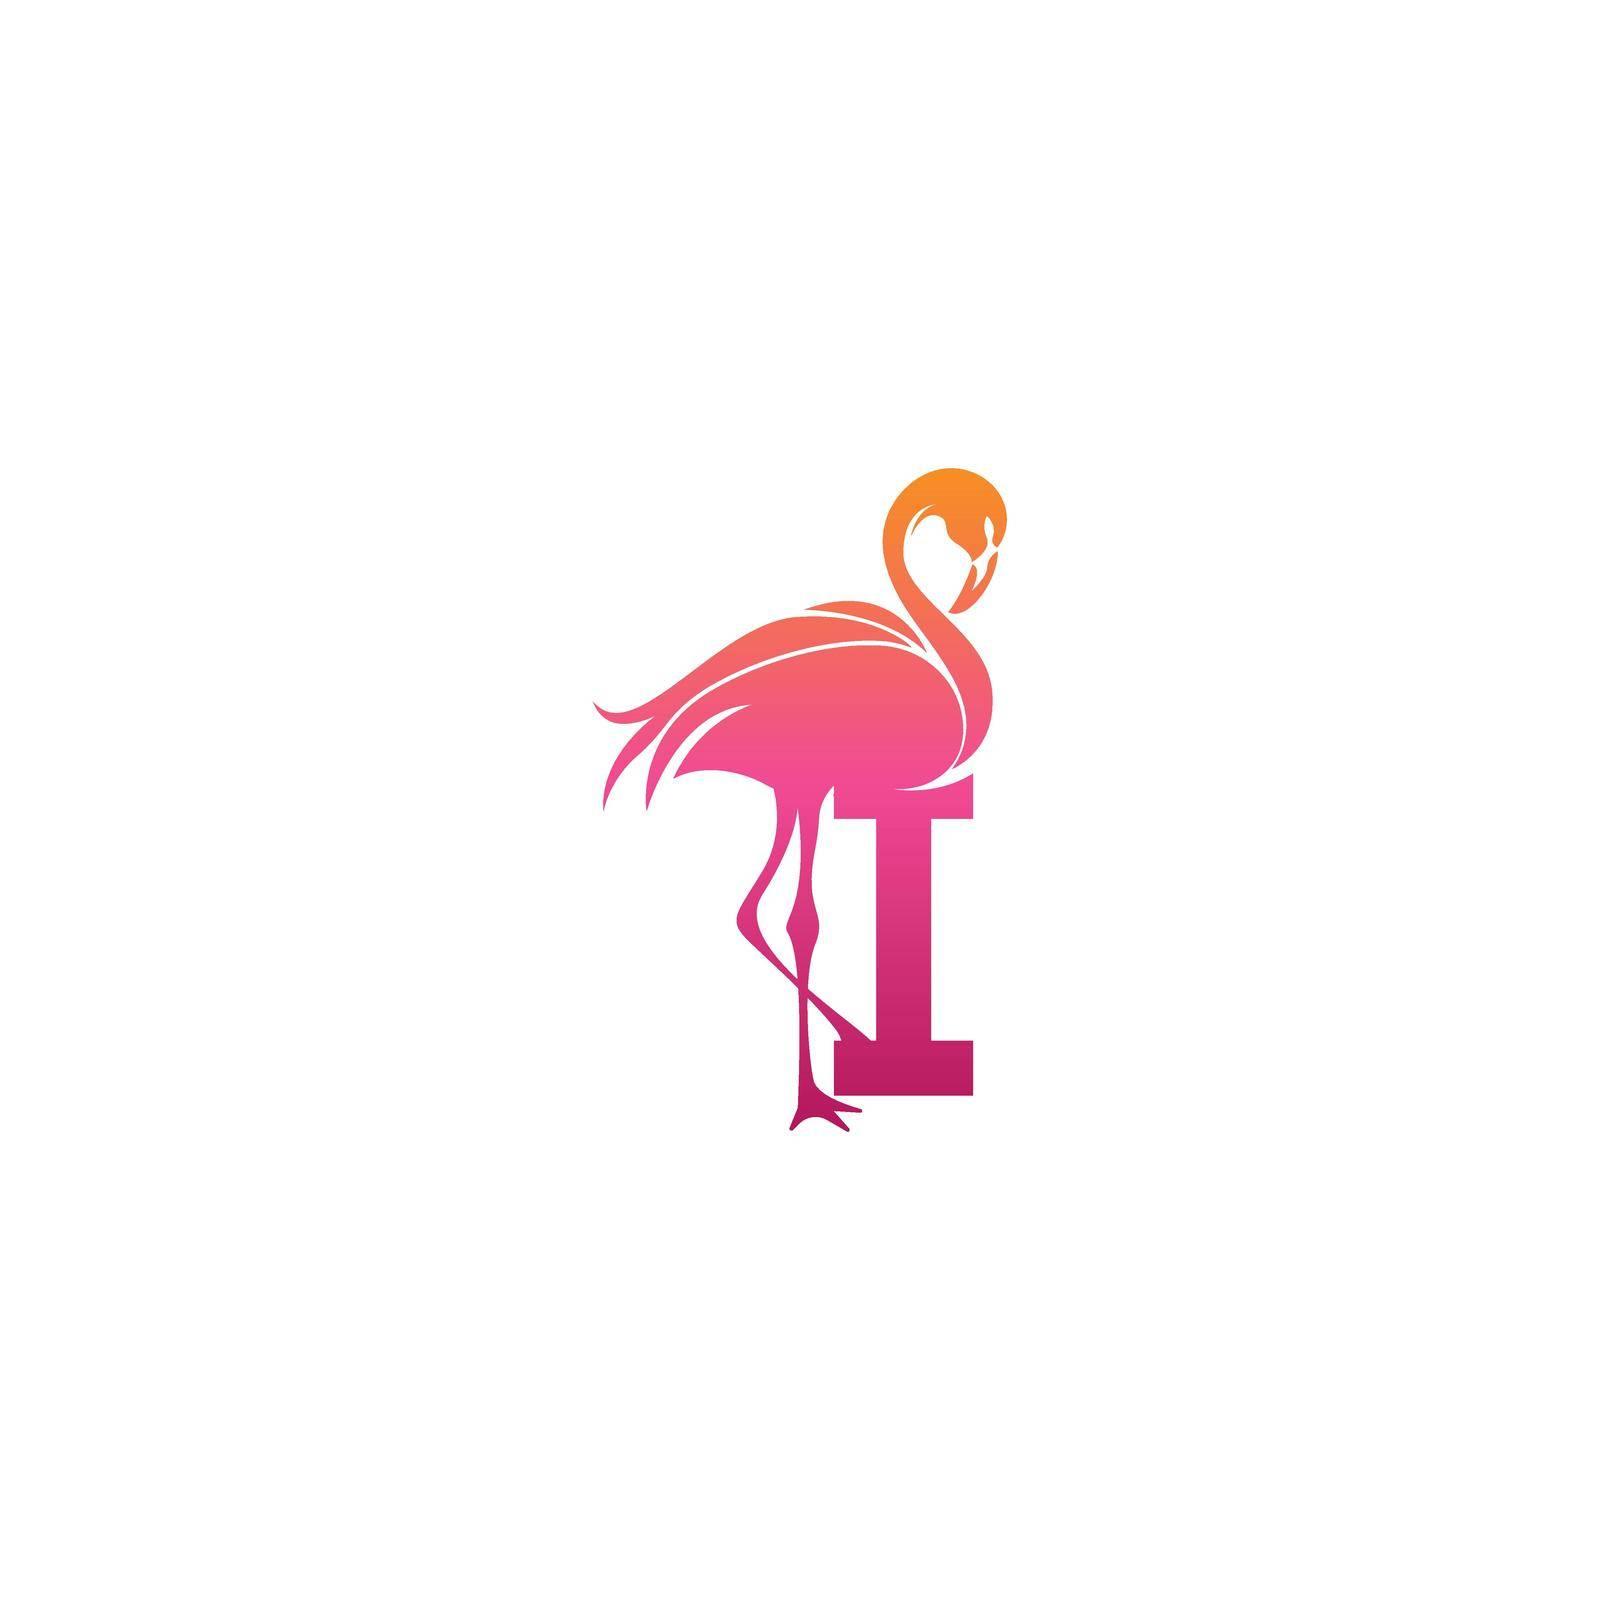 Flamingo bird icon with letter I Logo design vector template